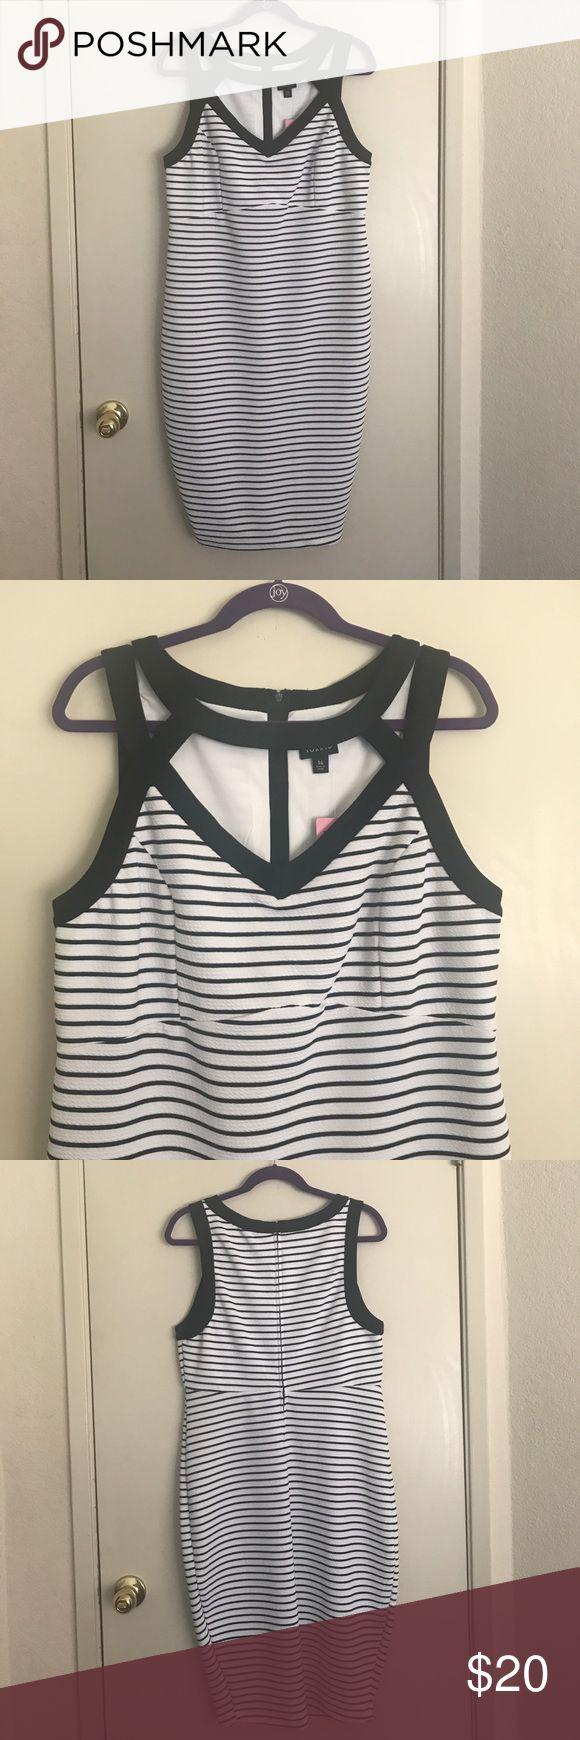 Black and White stripe Bodycon Dress Torrid Black and White Stripe Bodycon Midi Dress Size 14 NWT  Never been worn but tried on once :) torrid Dresses Midi